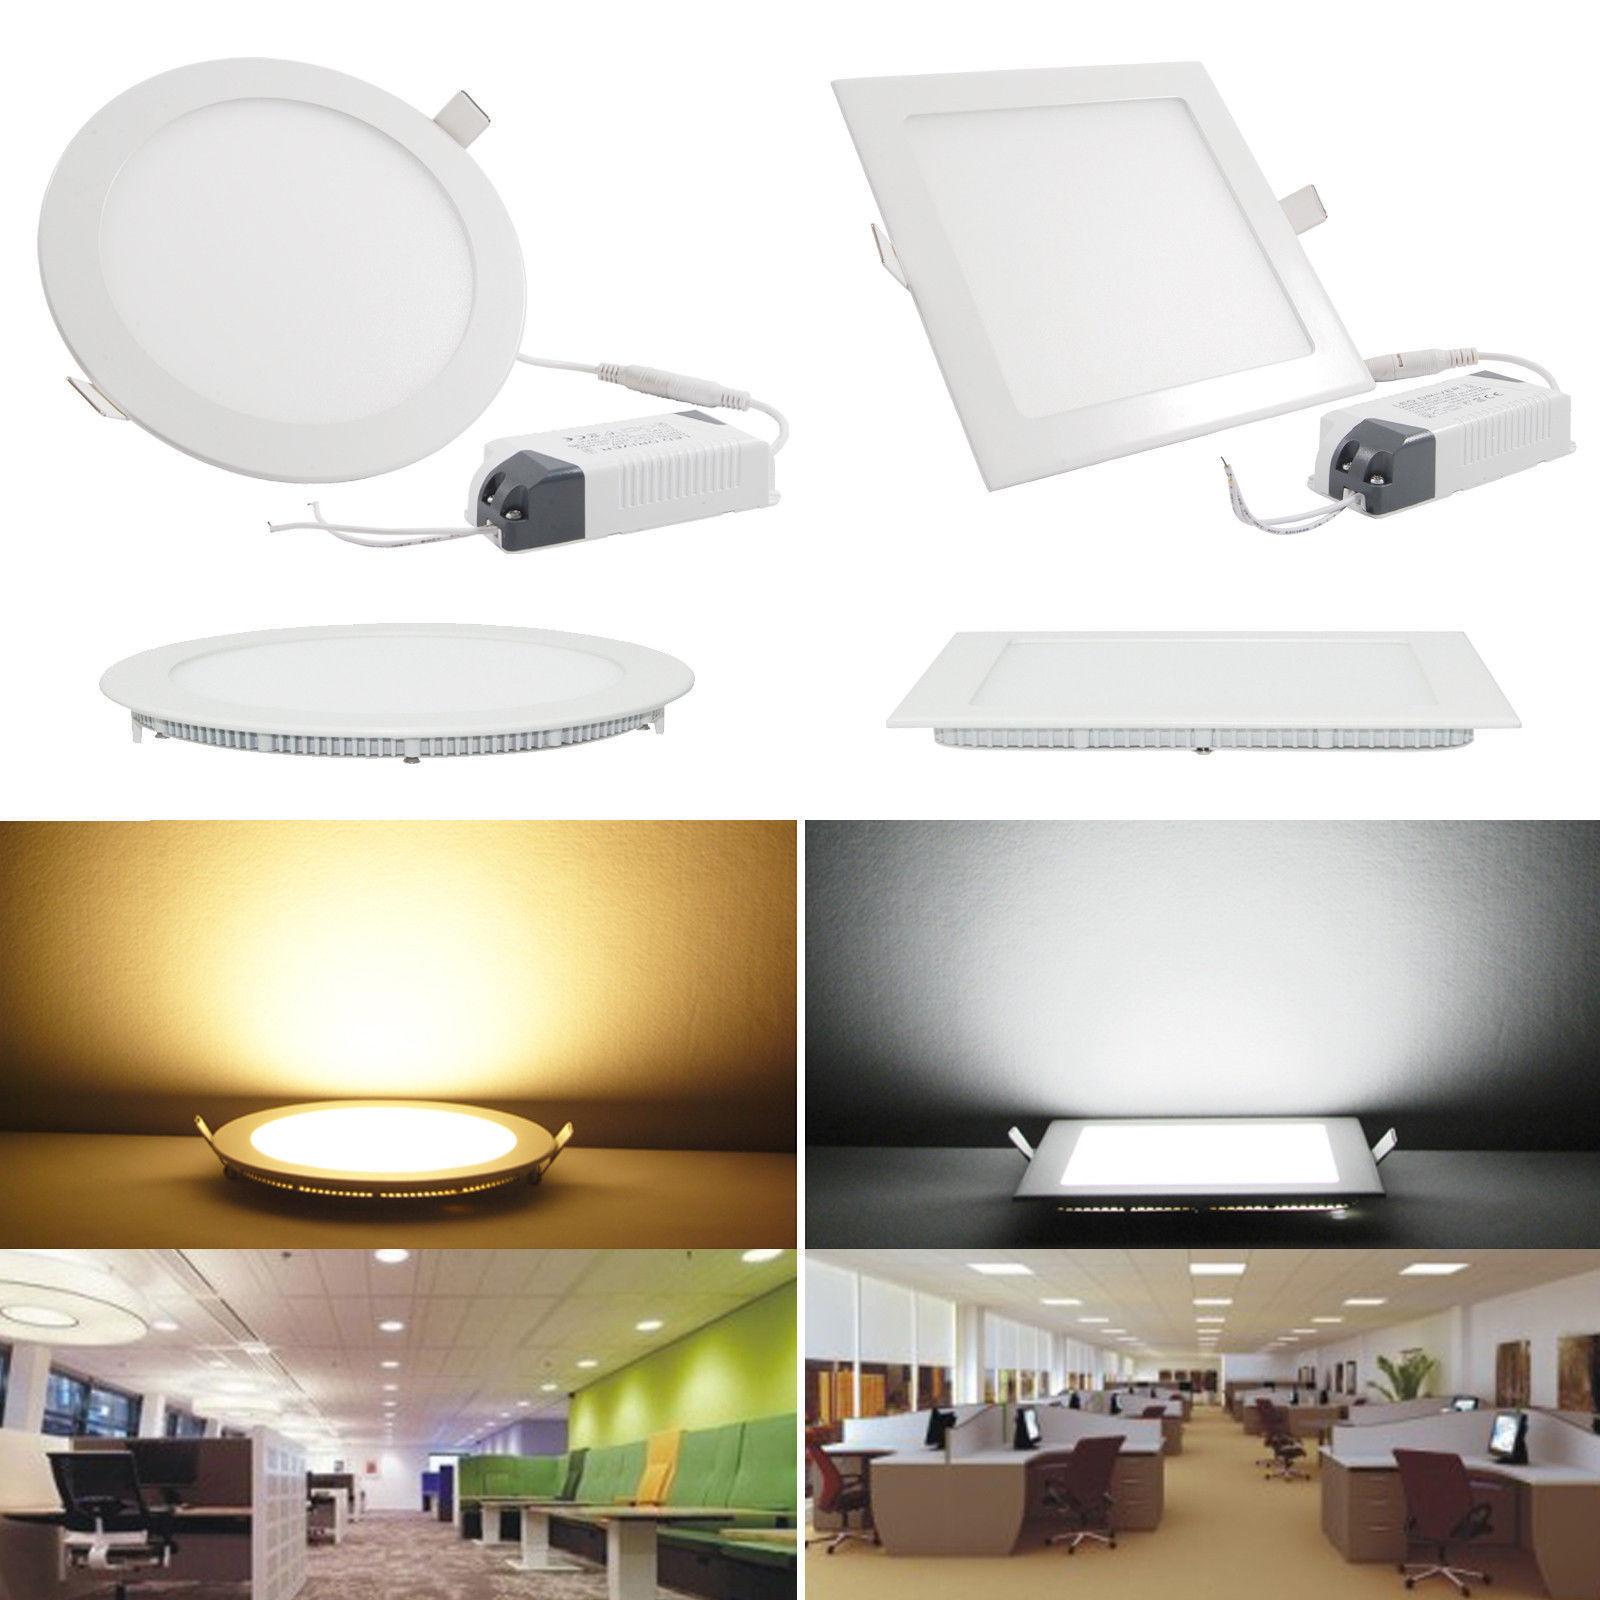 6W 12W 18W 24W LED Recessed Ceiling Flat Panel Down Light